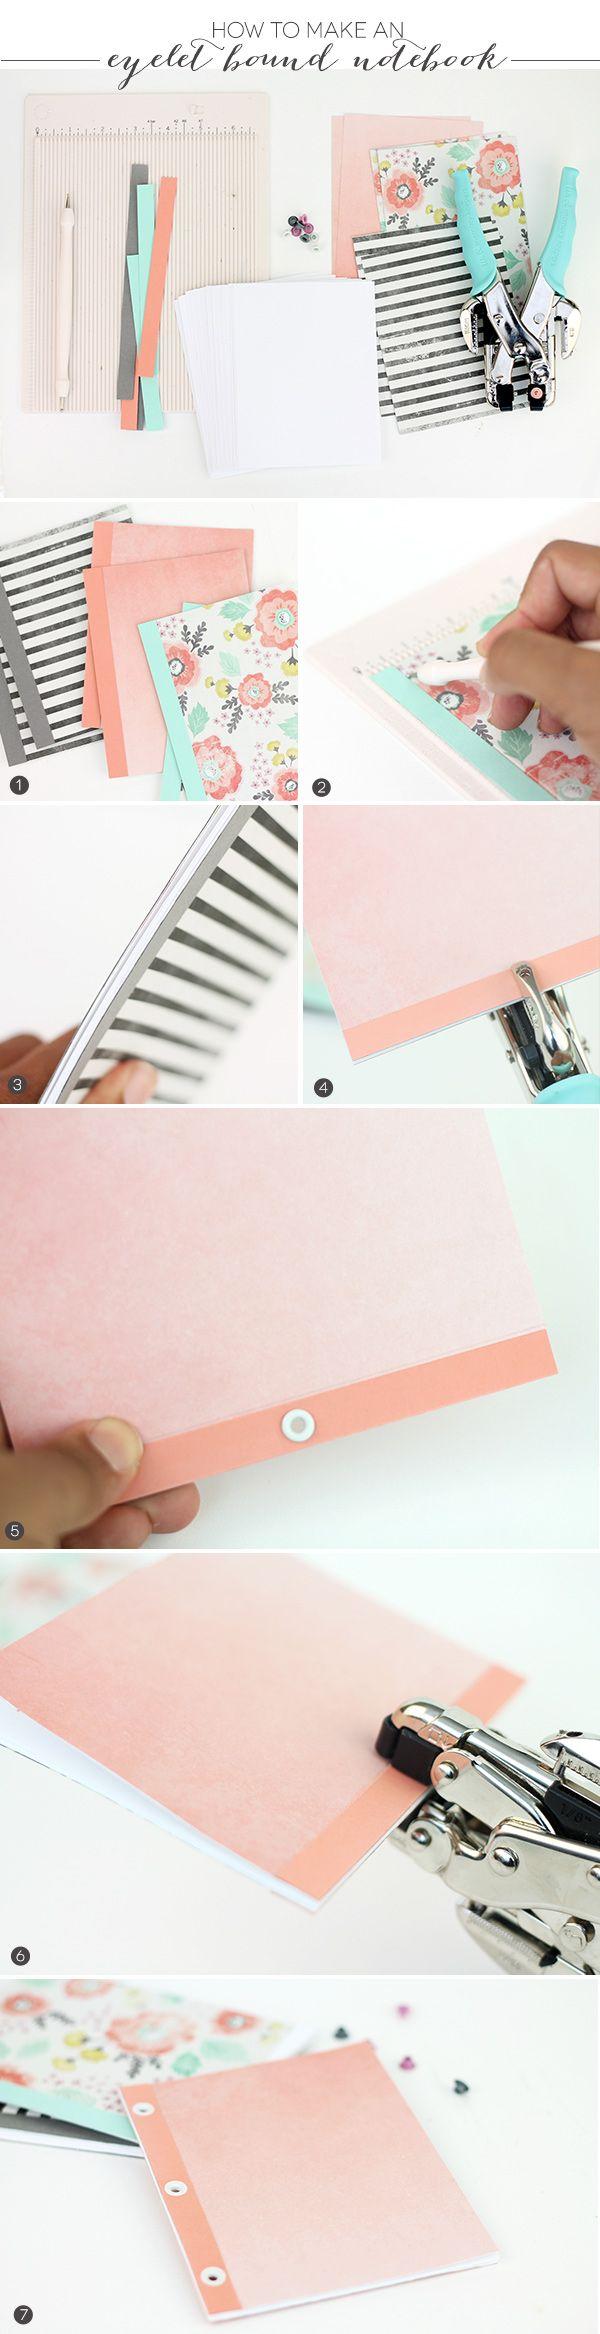 Paper craft- eyelet bound notebooks Eyelet Bound Notebooks | damask love